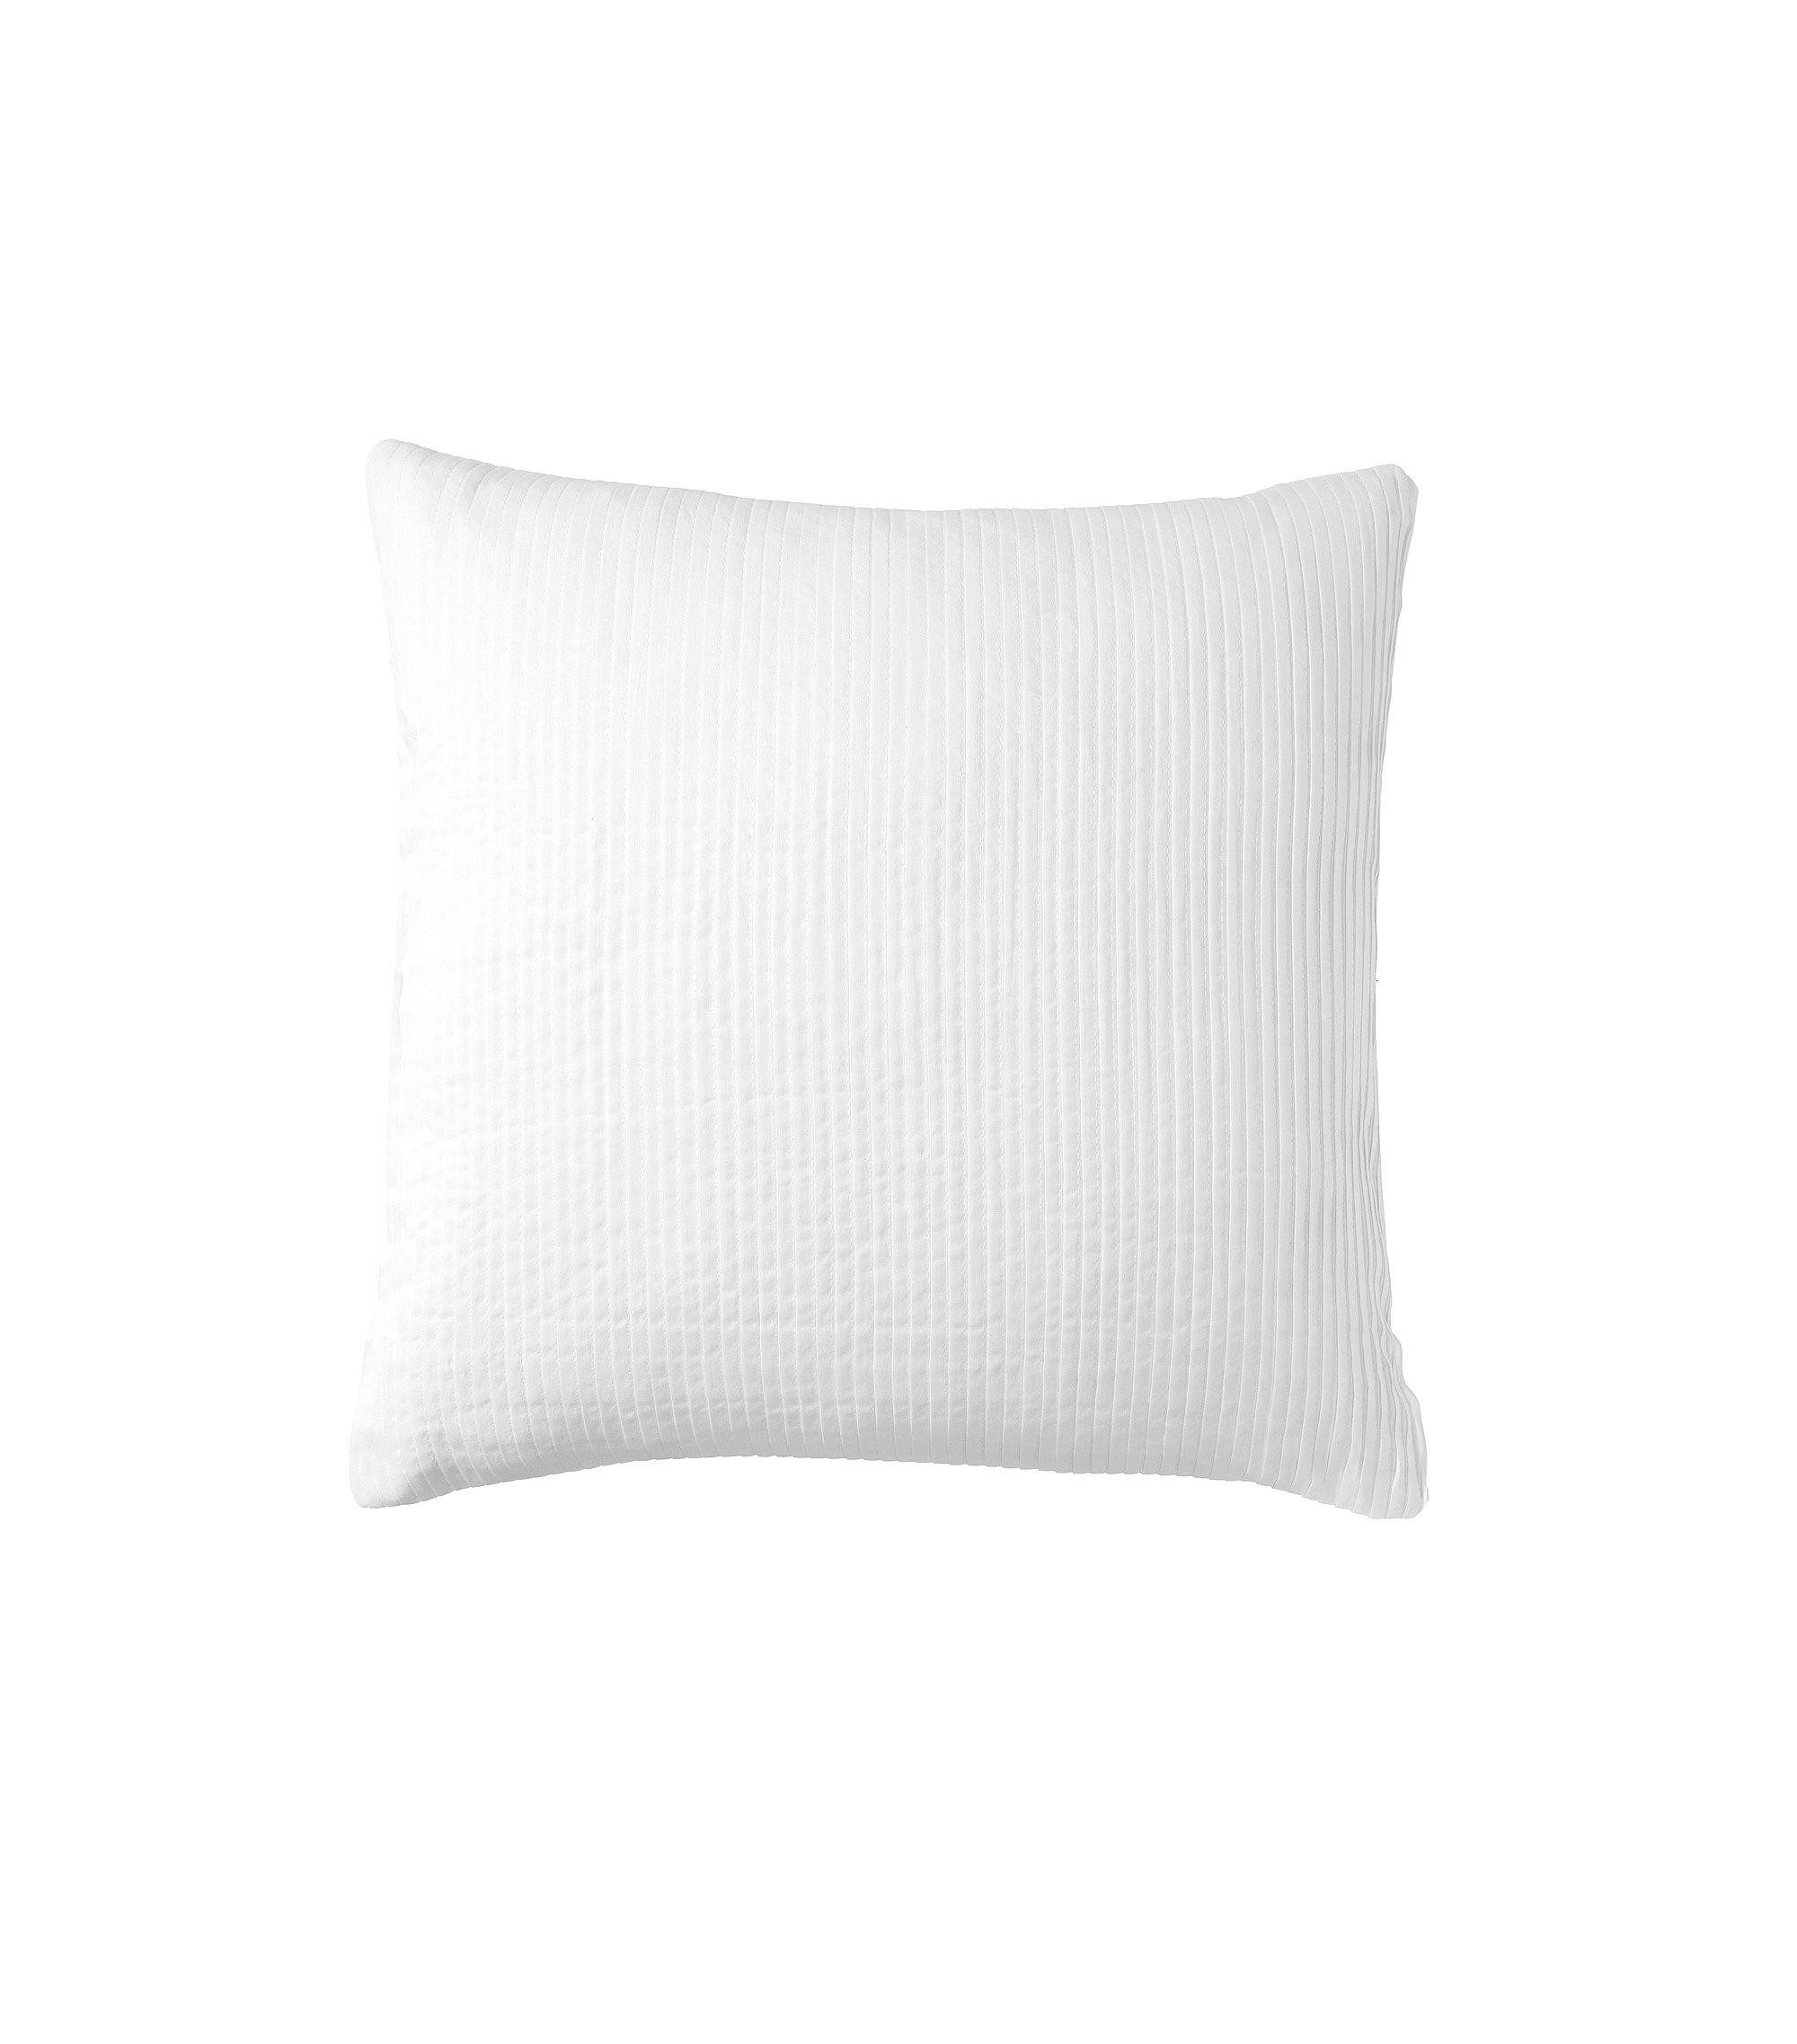 Unifarbene Kissenhülle ´BREEZE` aus Baumwolle, Weiß